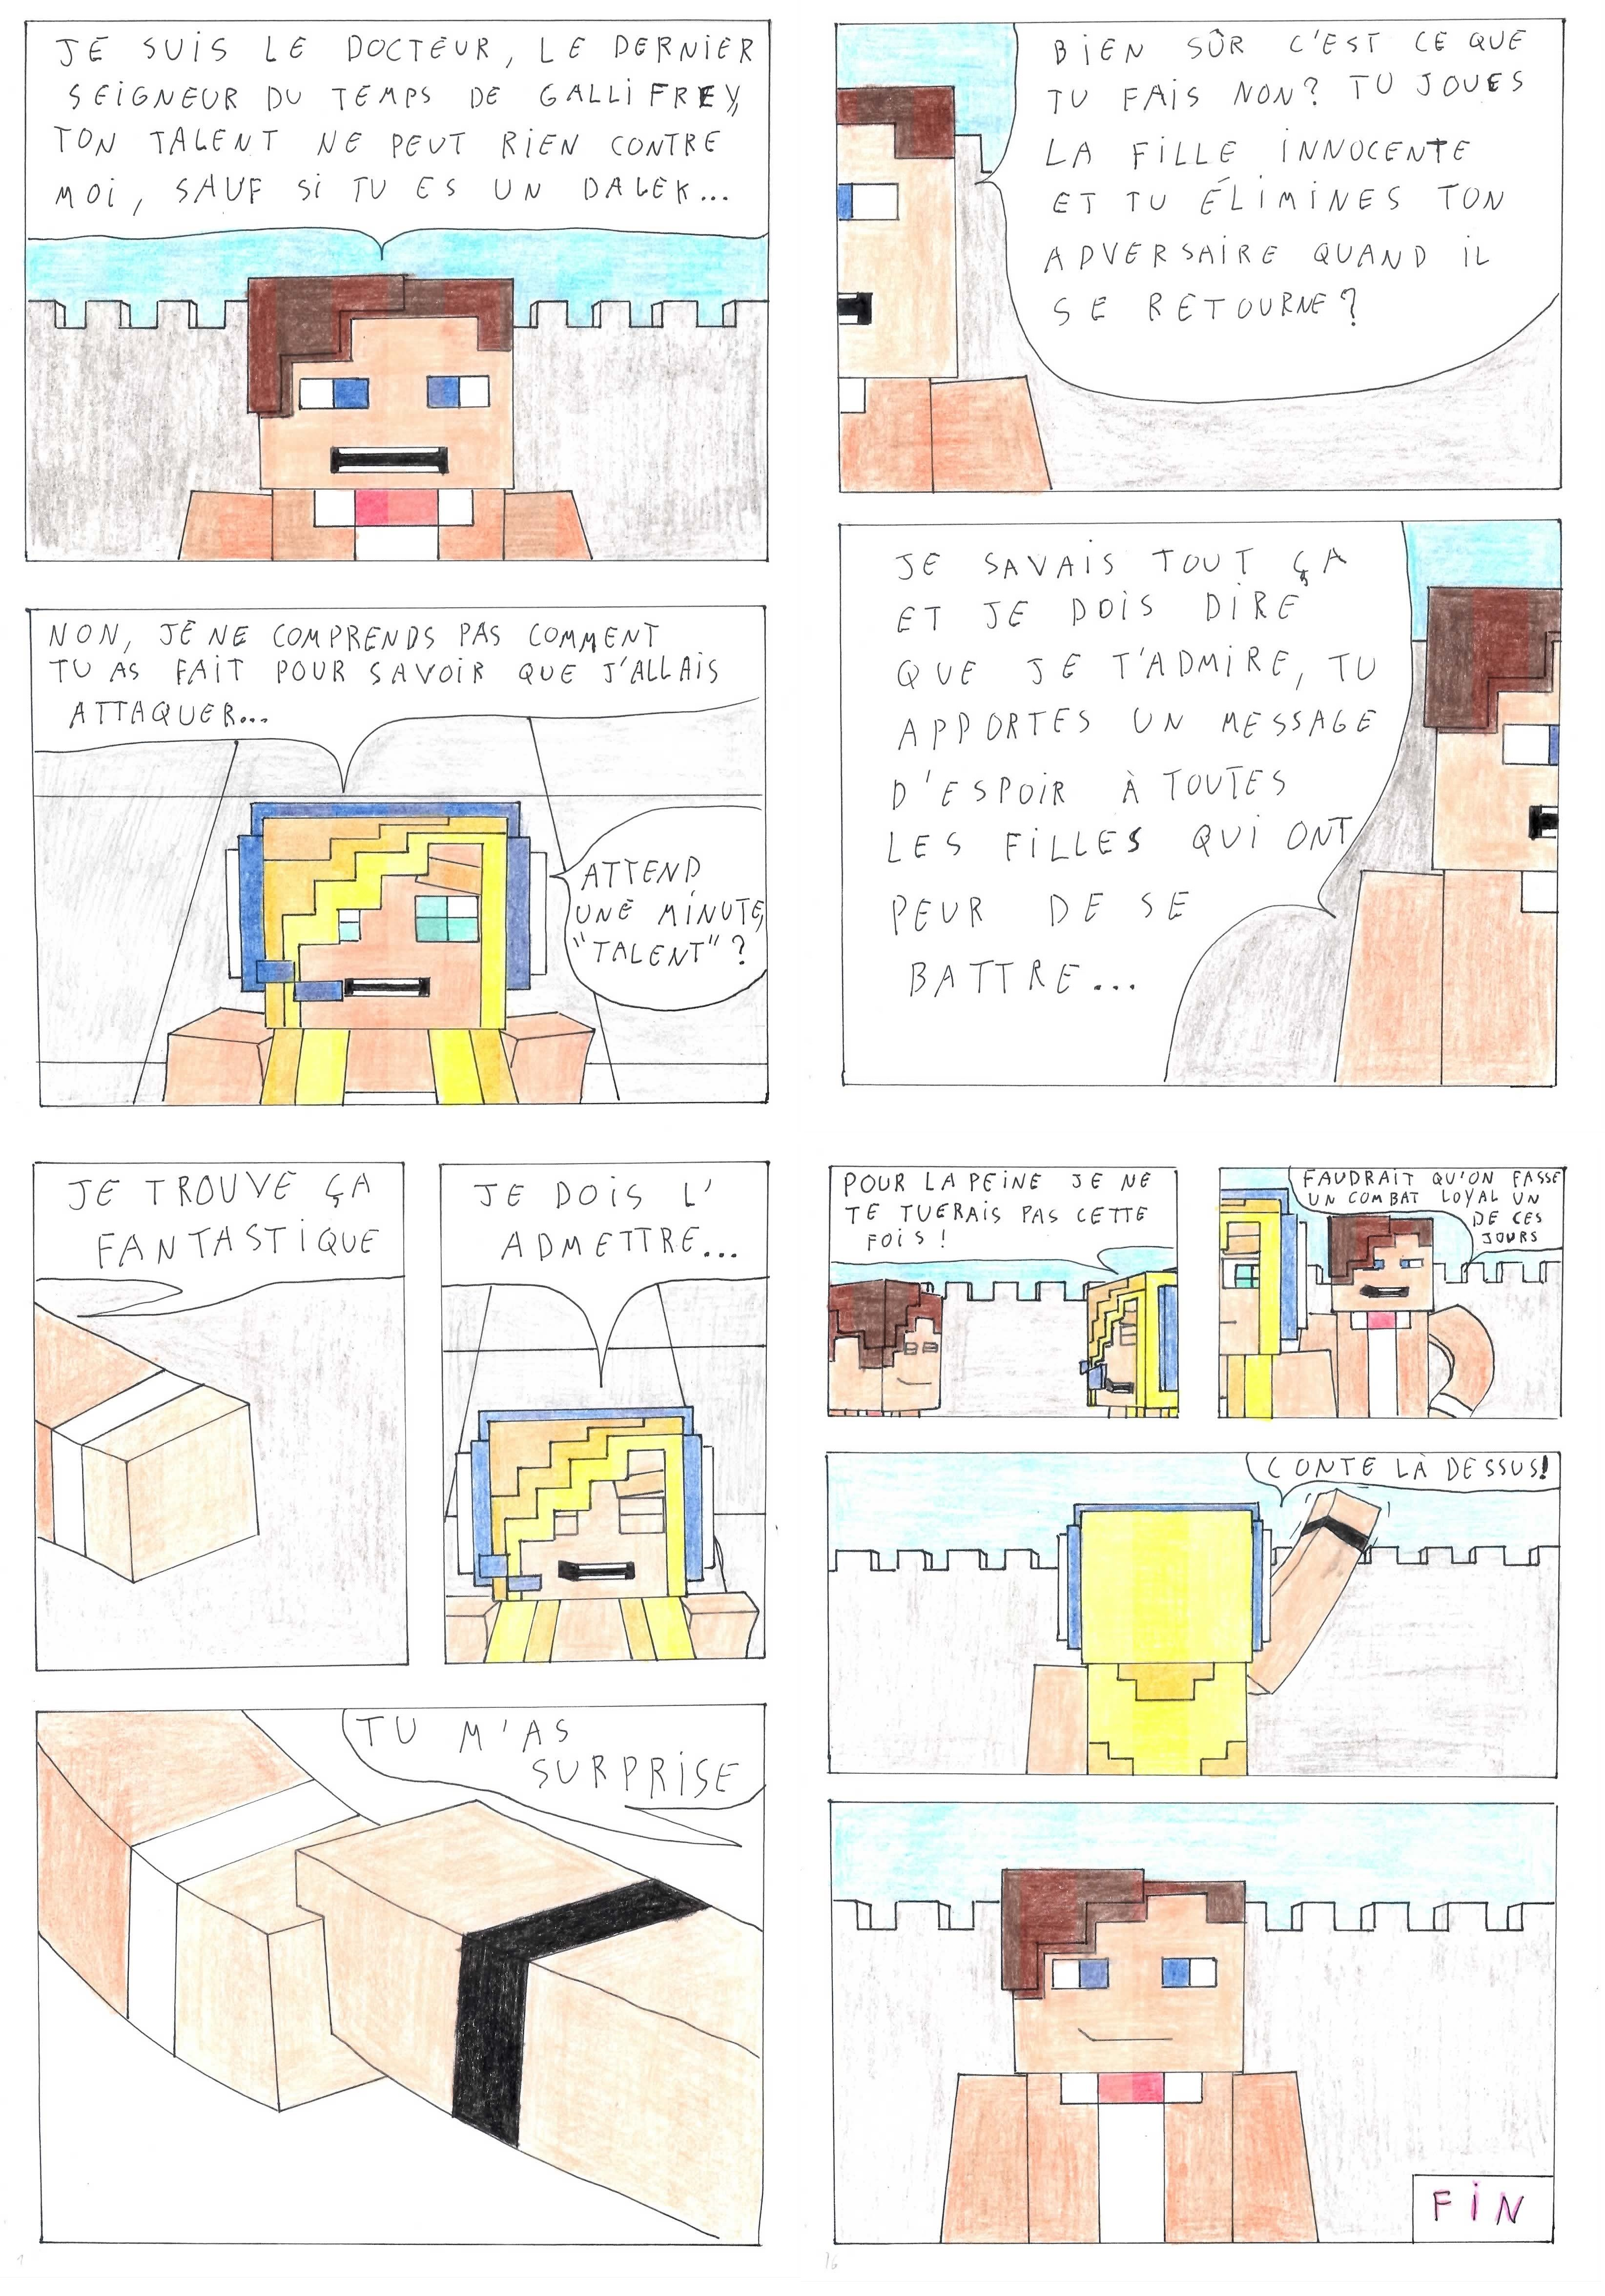 10-10) Rencontre part10 [10-10-10]  Psycho girl, Minecraft games